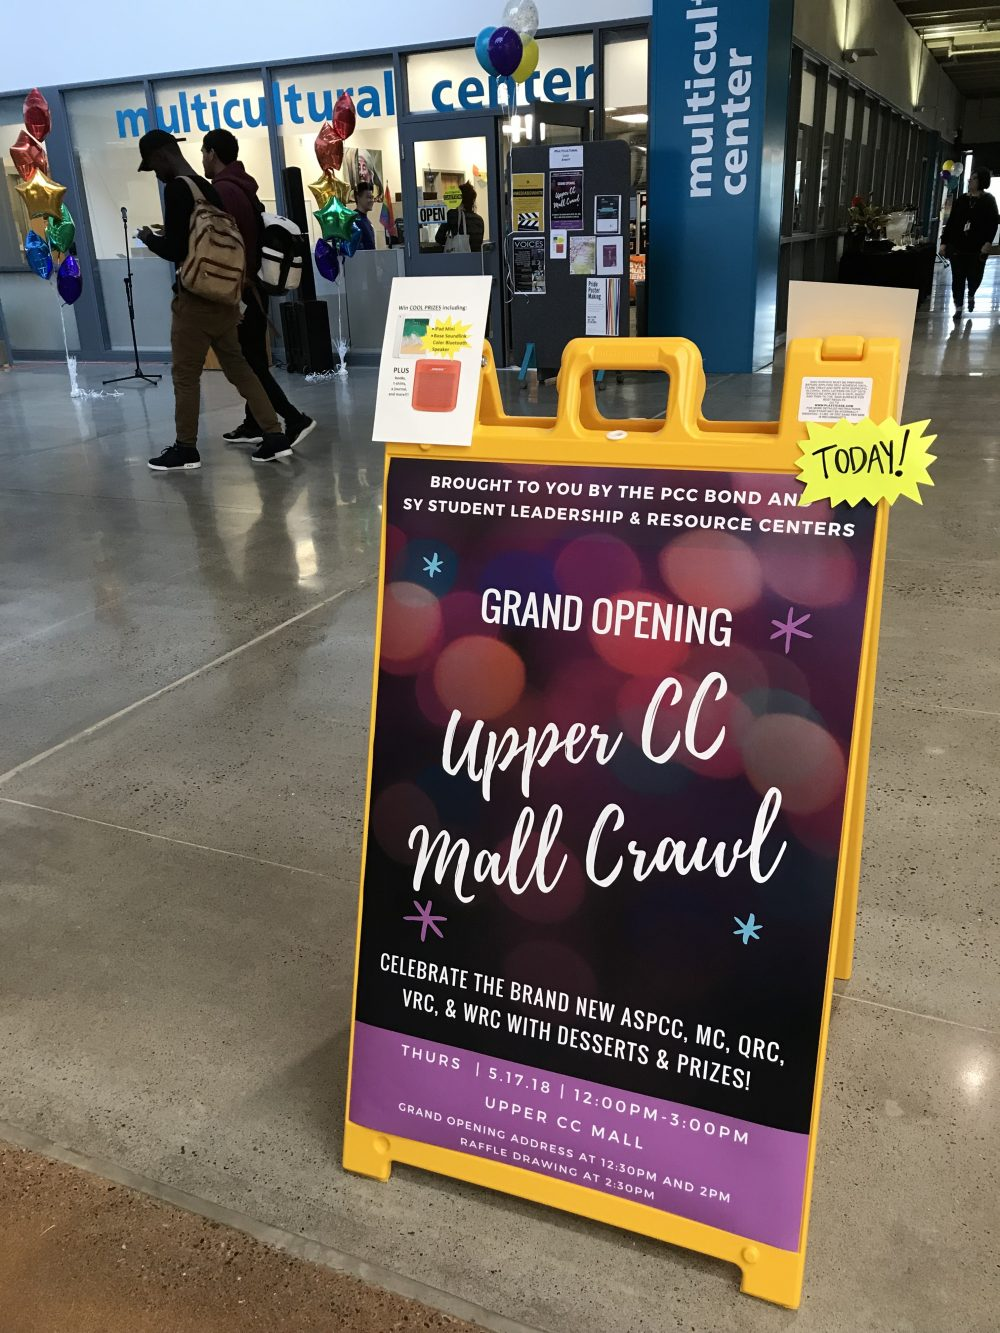 Upper Mall Crawl event